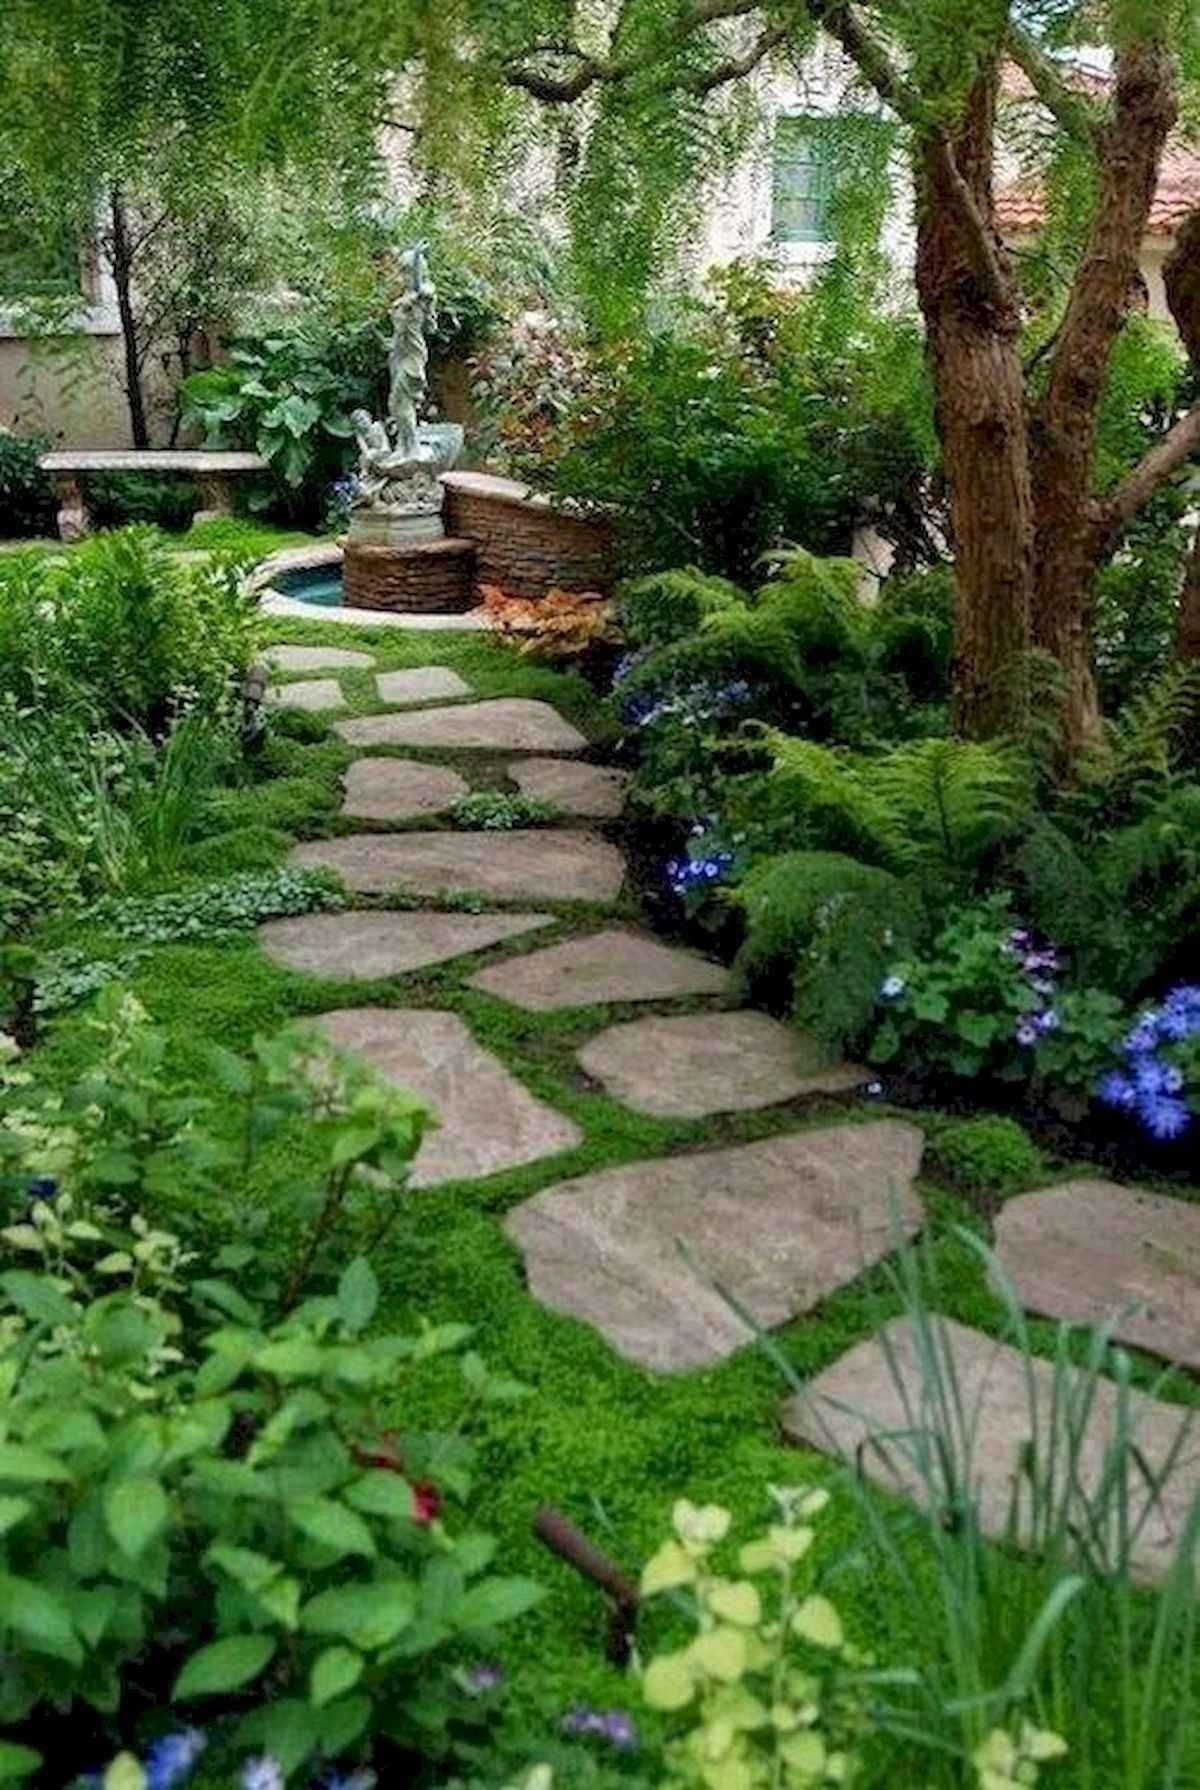 Fresh Modern Backyard Landscaping Design Ideas 44 Front Yard Landscaping Design Modern Backyard Garden Hammock